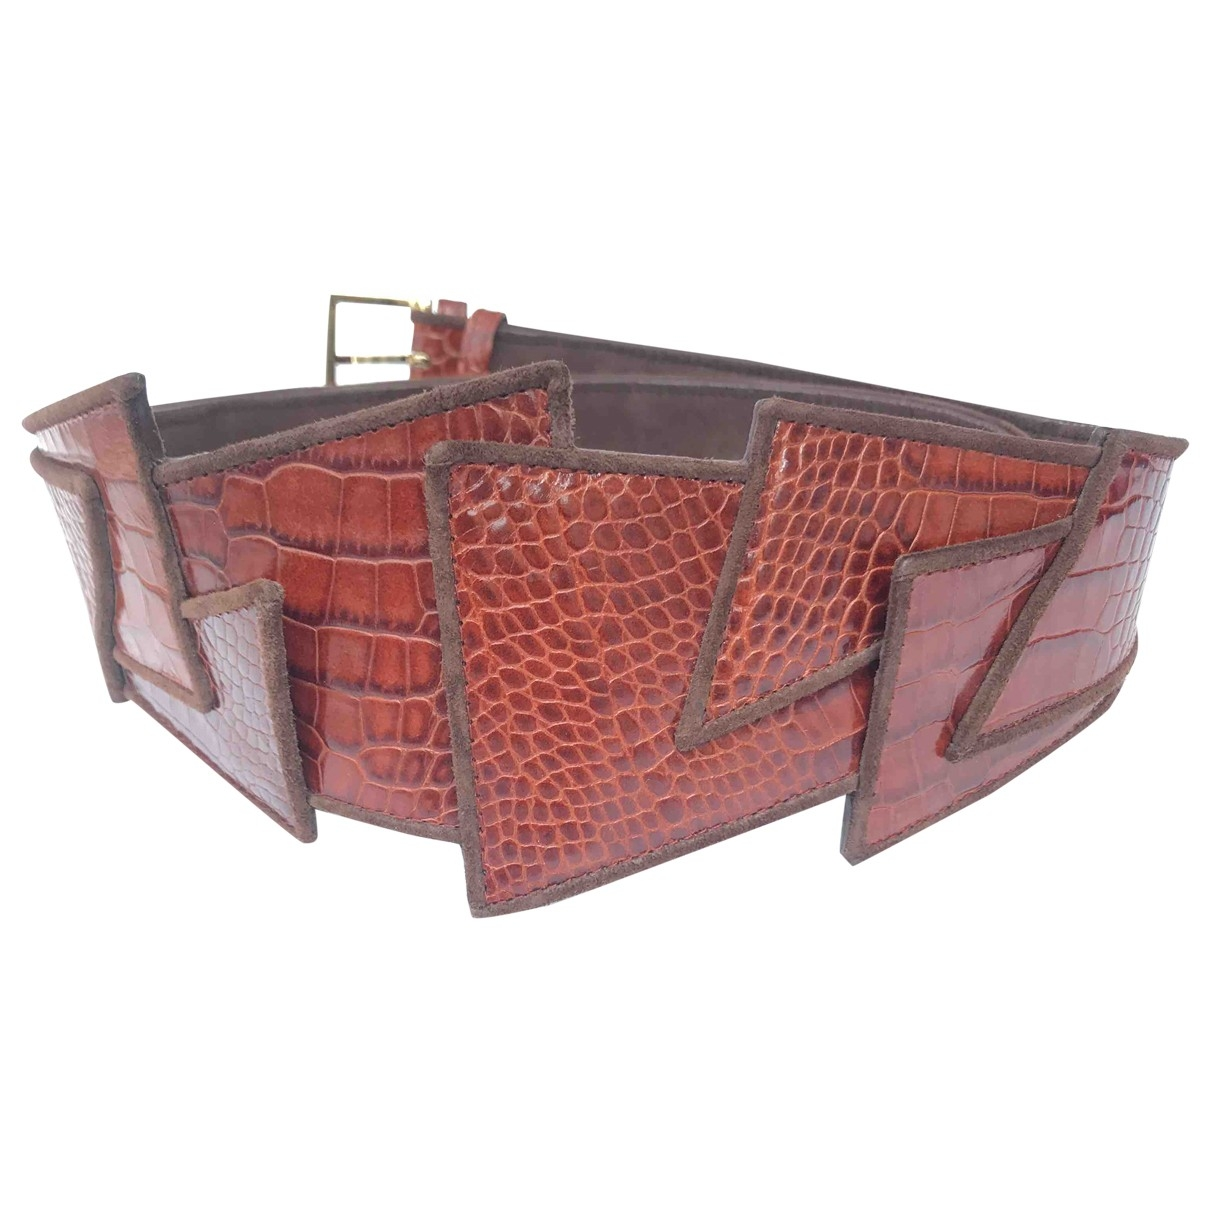 Lara Bohinc \N Brown Leather belt for Women 35 Inches